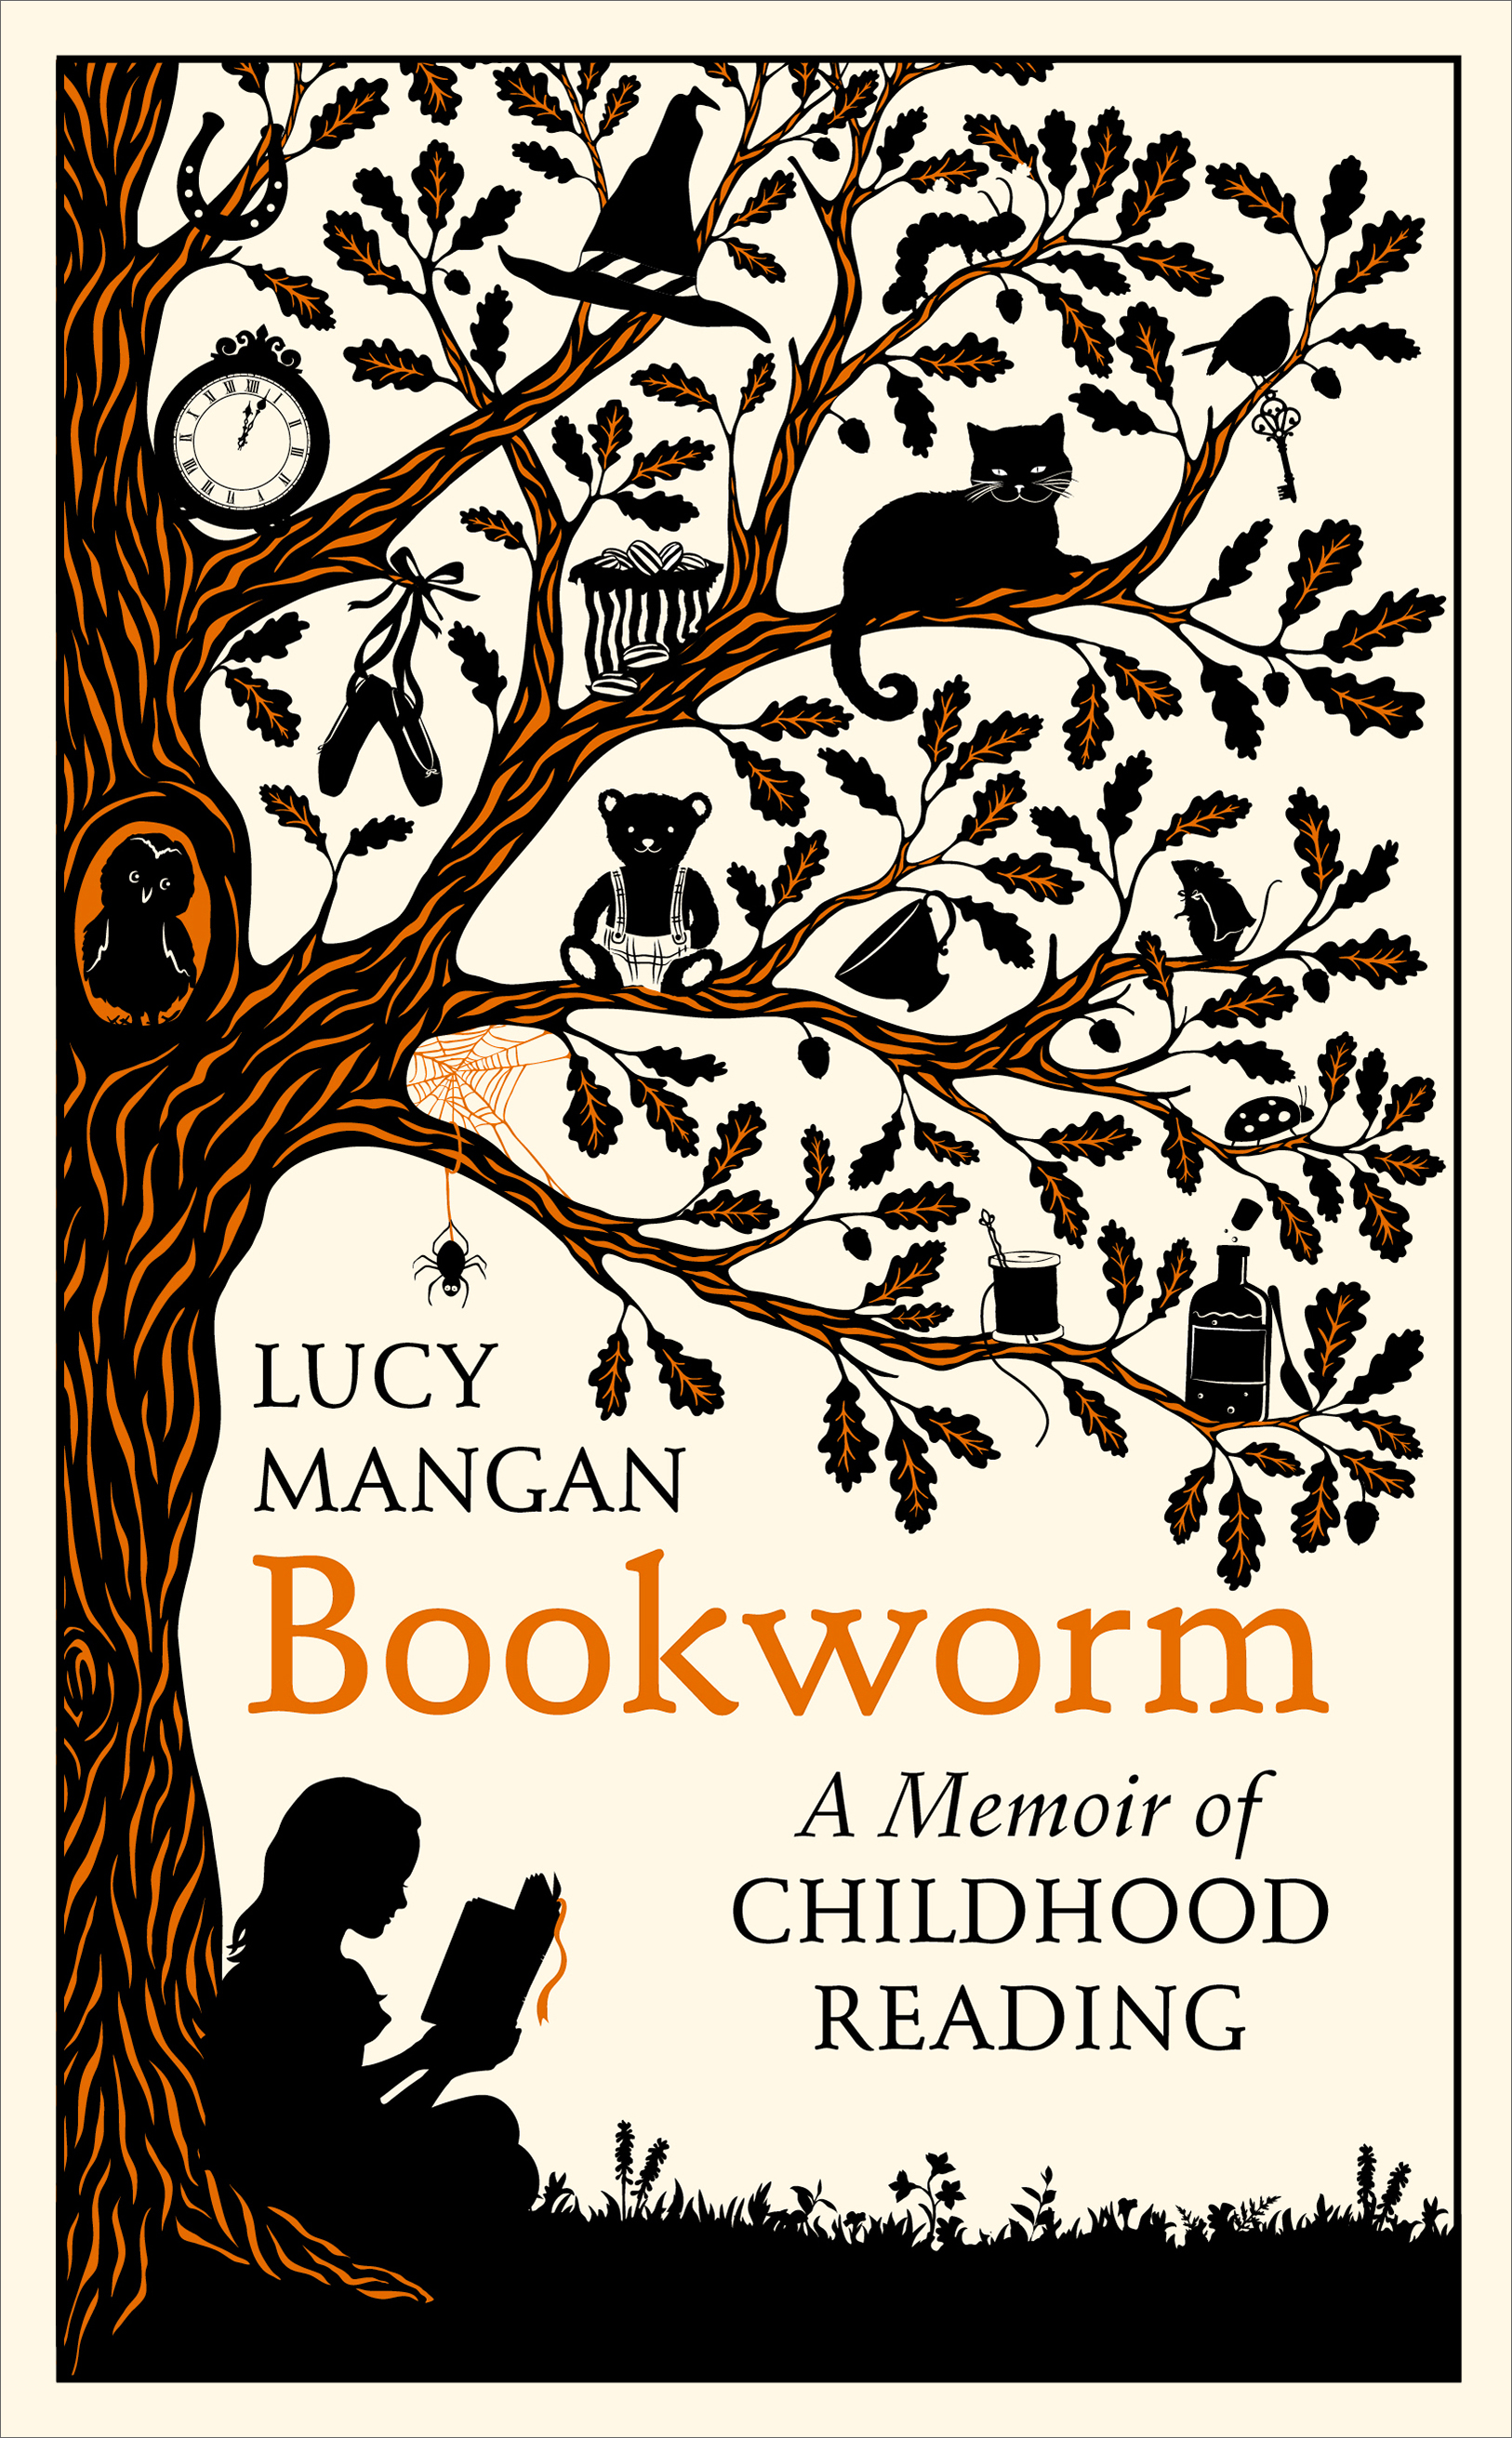 BOOKWORM final front cover.jpg